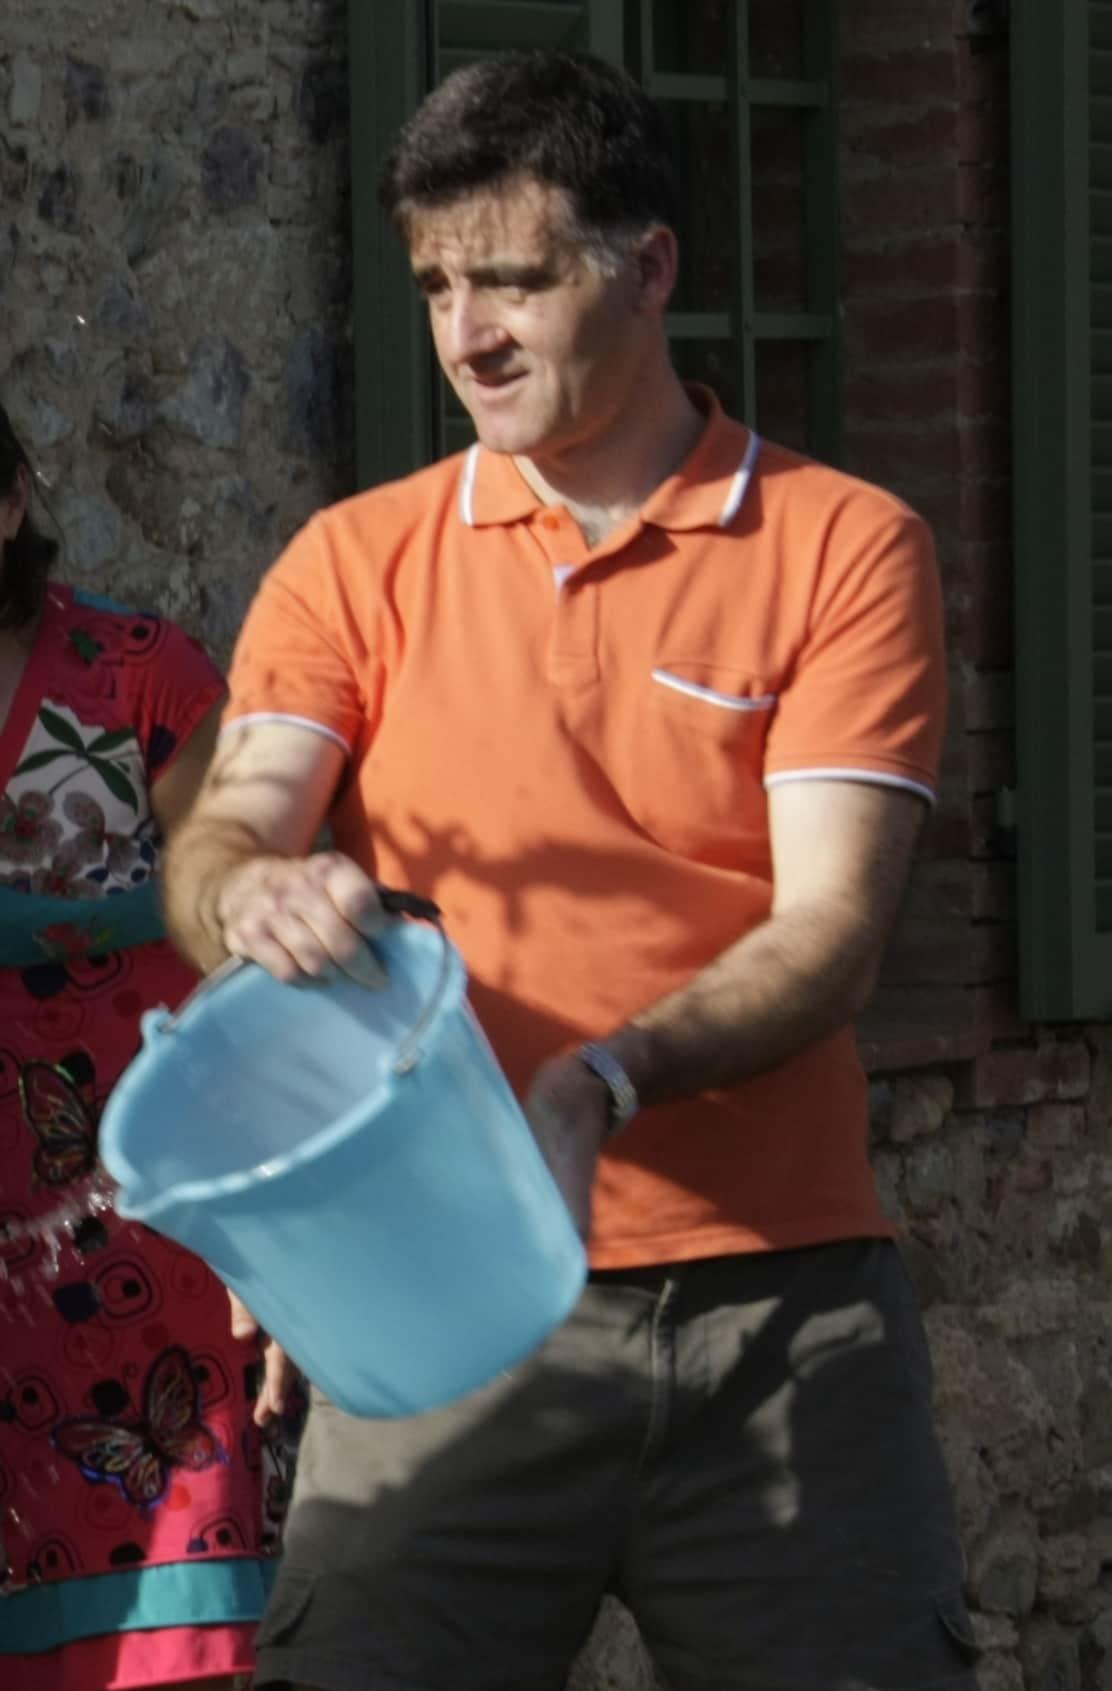 Fabio from Castelnuovo Berardenga